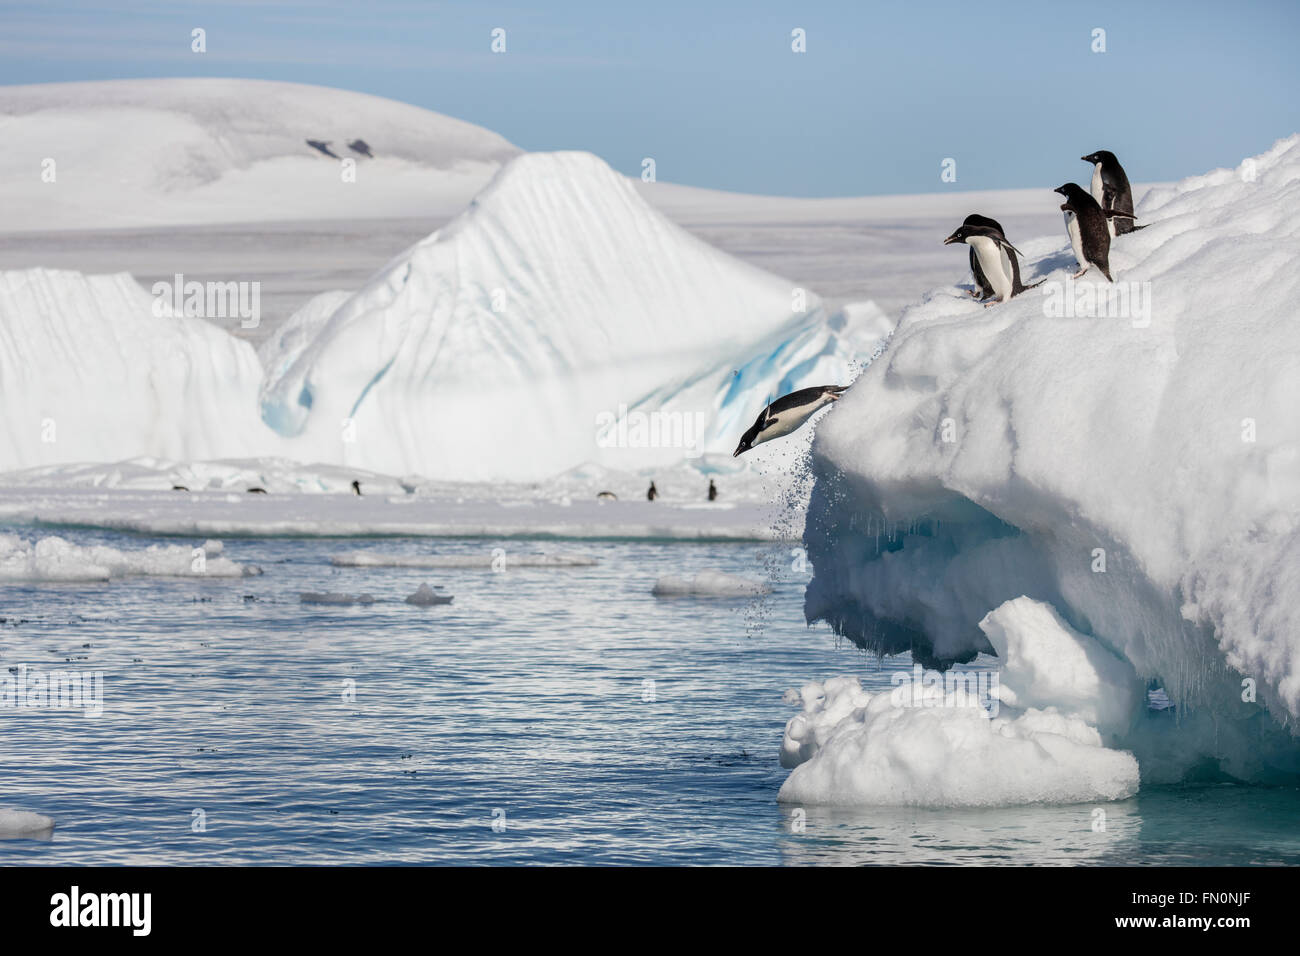 Antarctica, Antarctic peninsula, Brown Bluff. Adelie penguin, penguins diving off iceberg - Stock Image